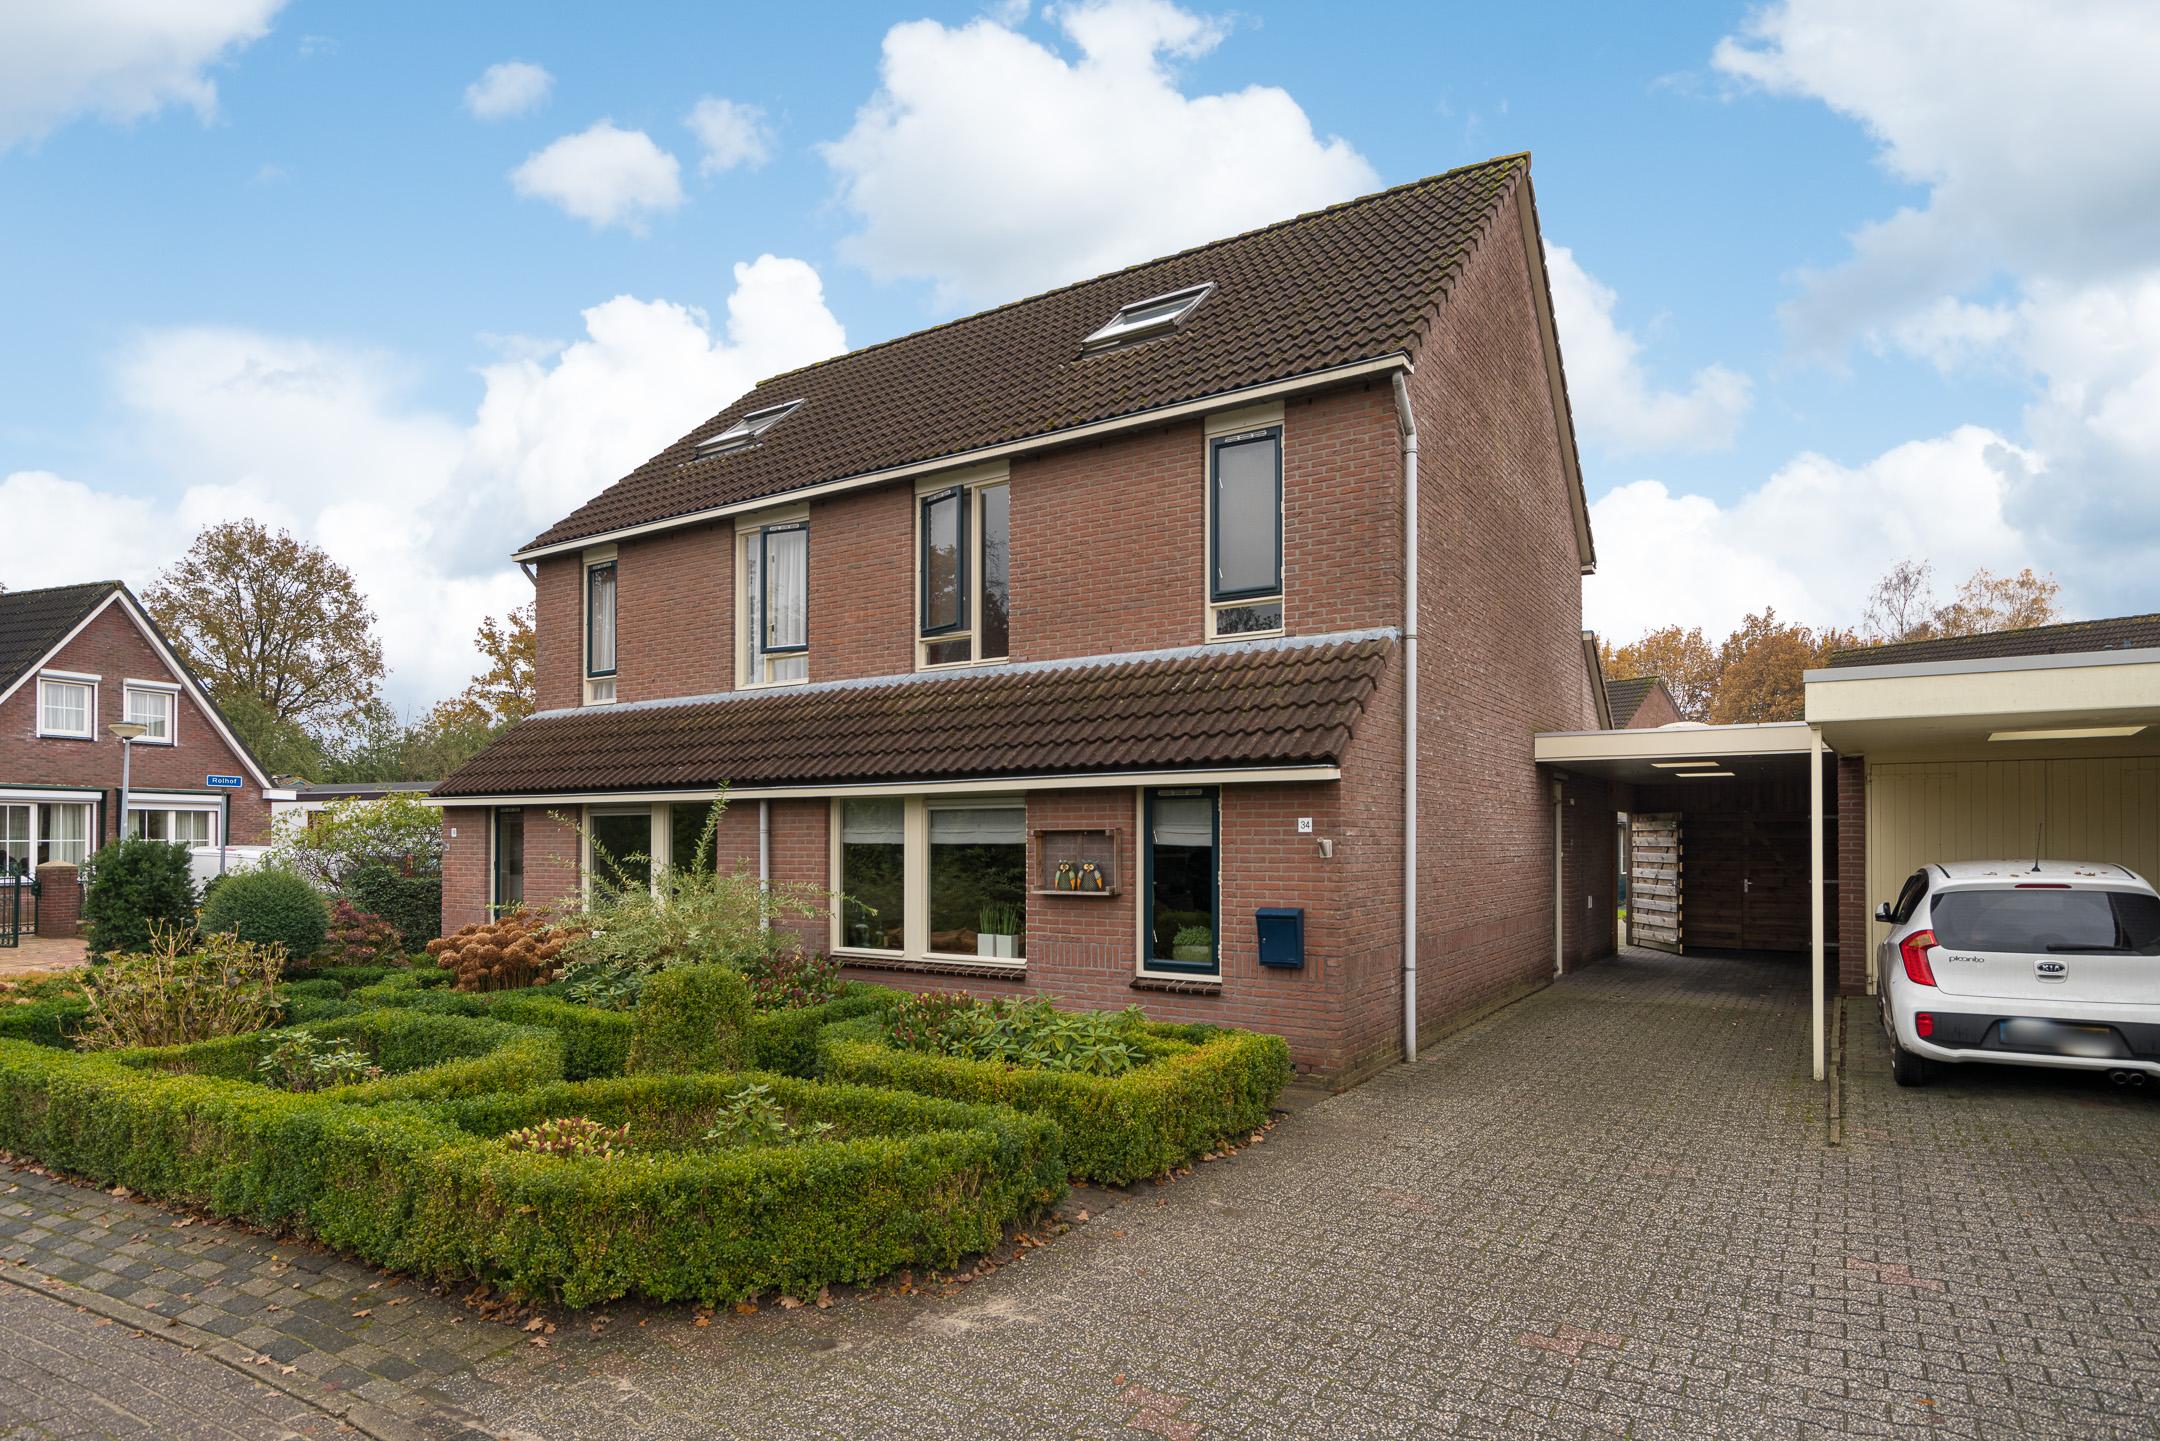 Verkocht: Houtduif 47, Emmen